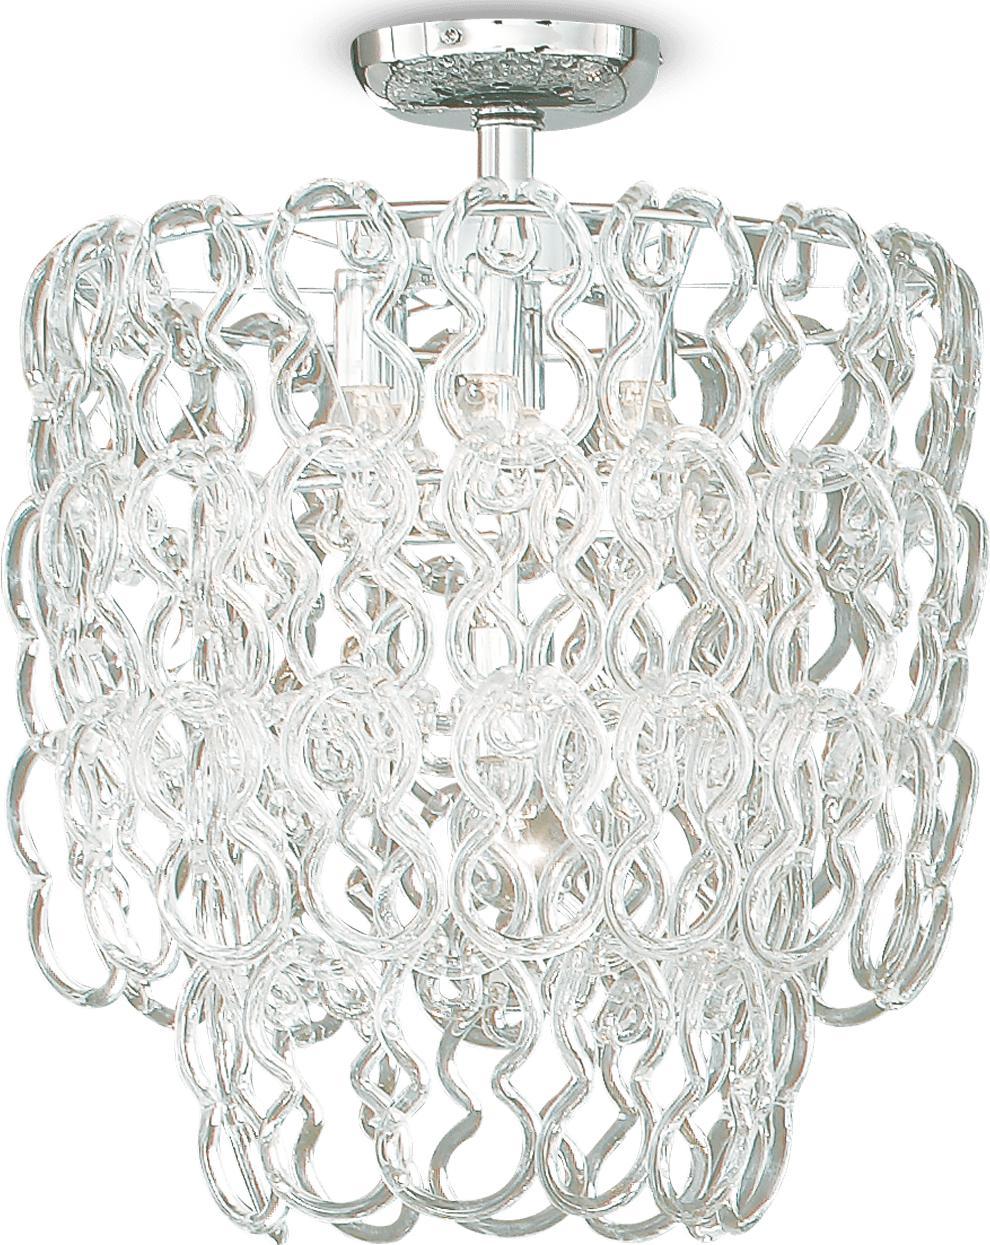 Ideal lux LED Alba decken Lampe 6x5W 25490